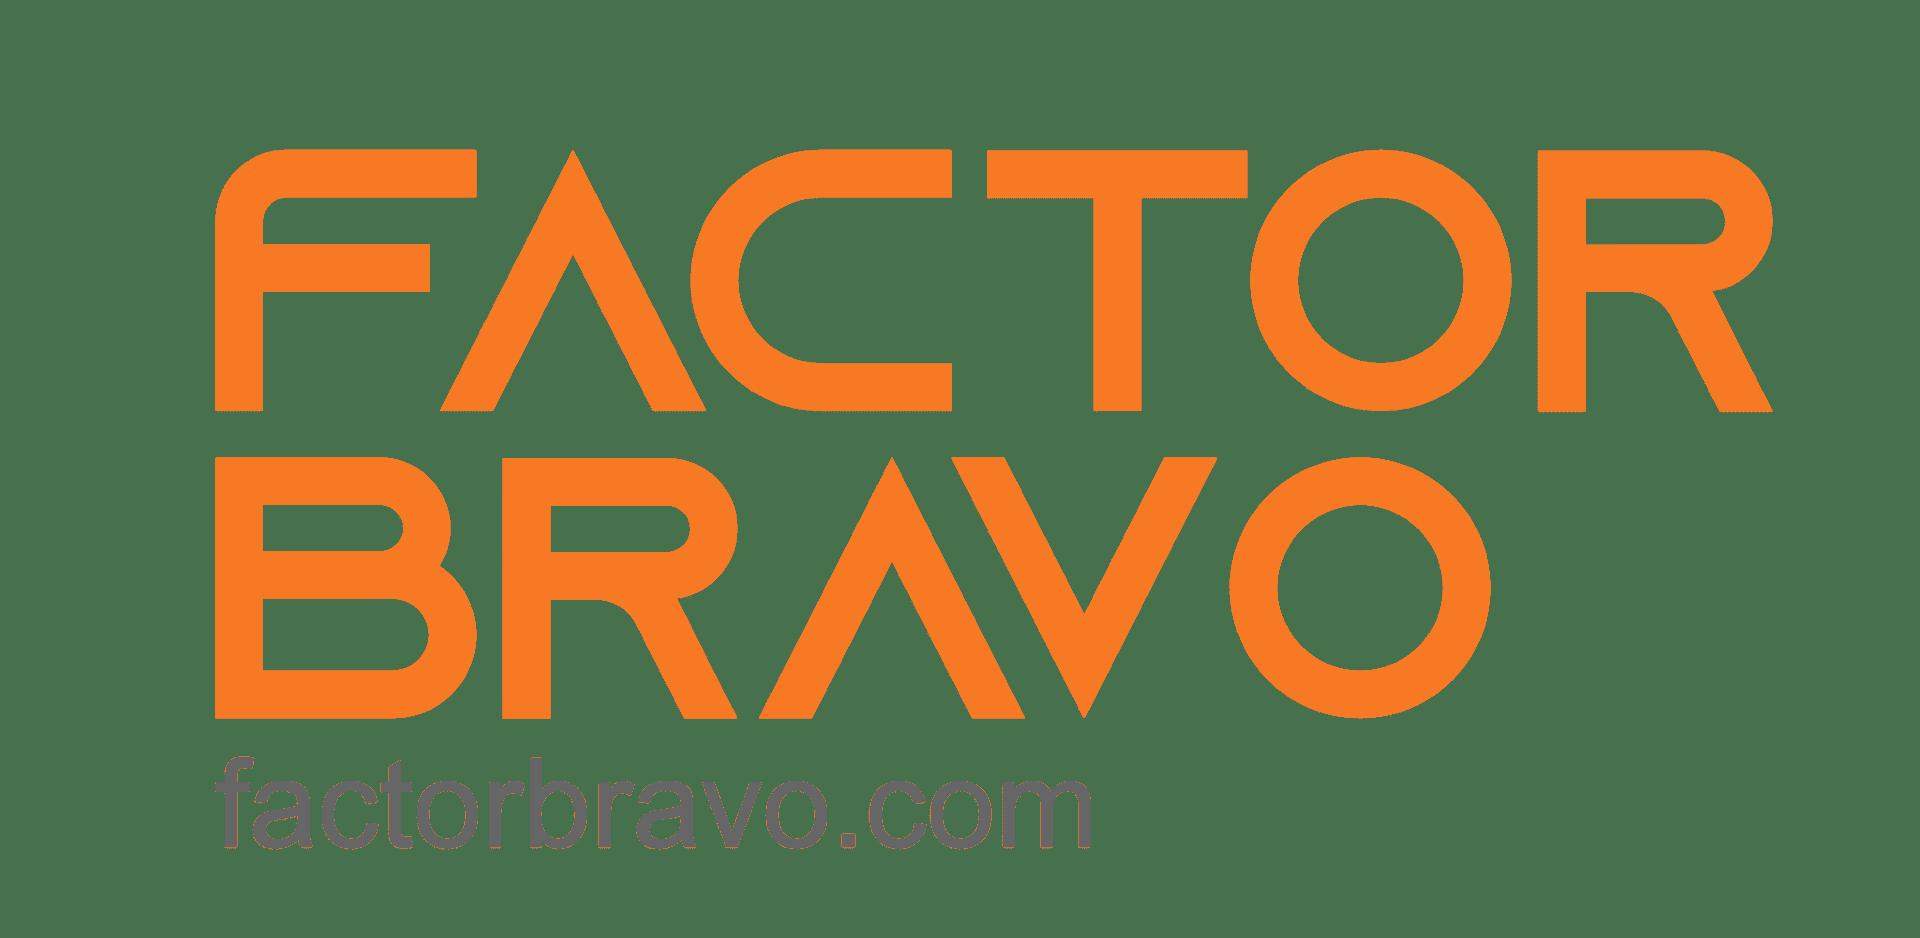 factorbravo